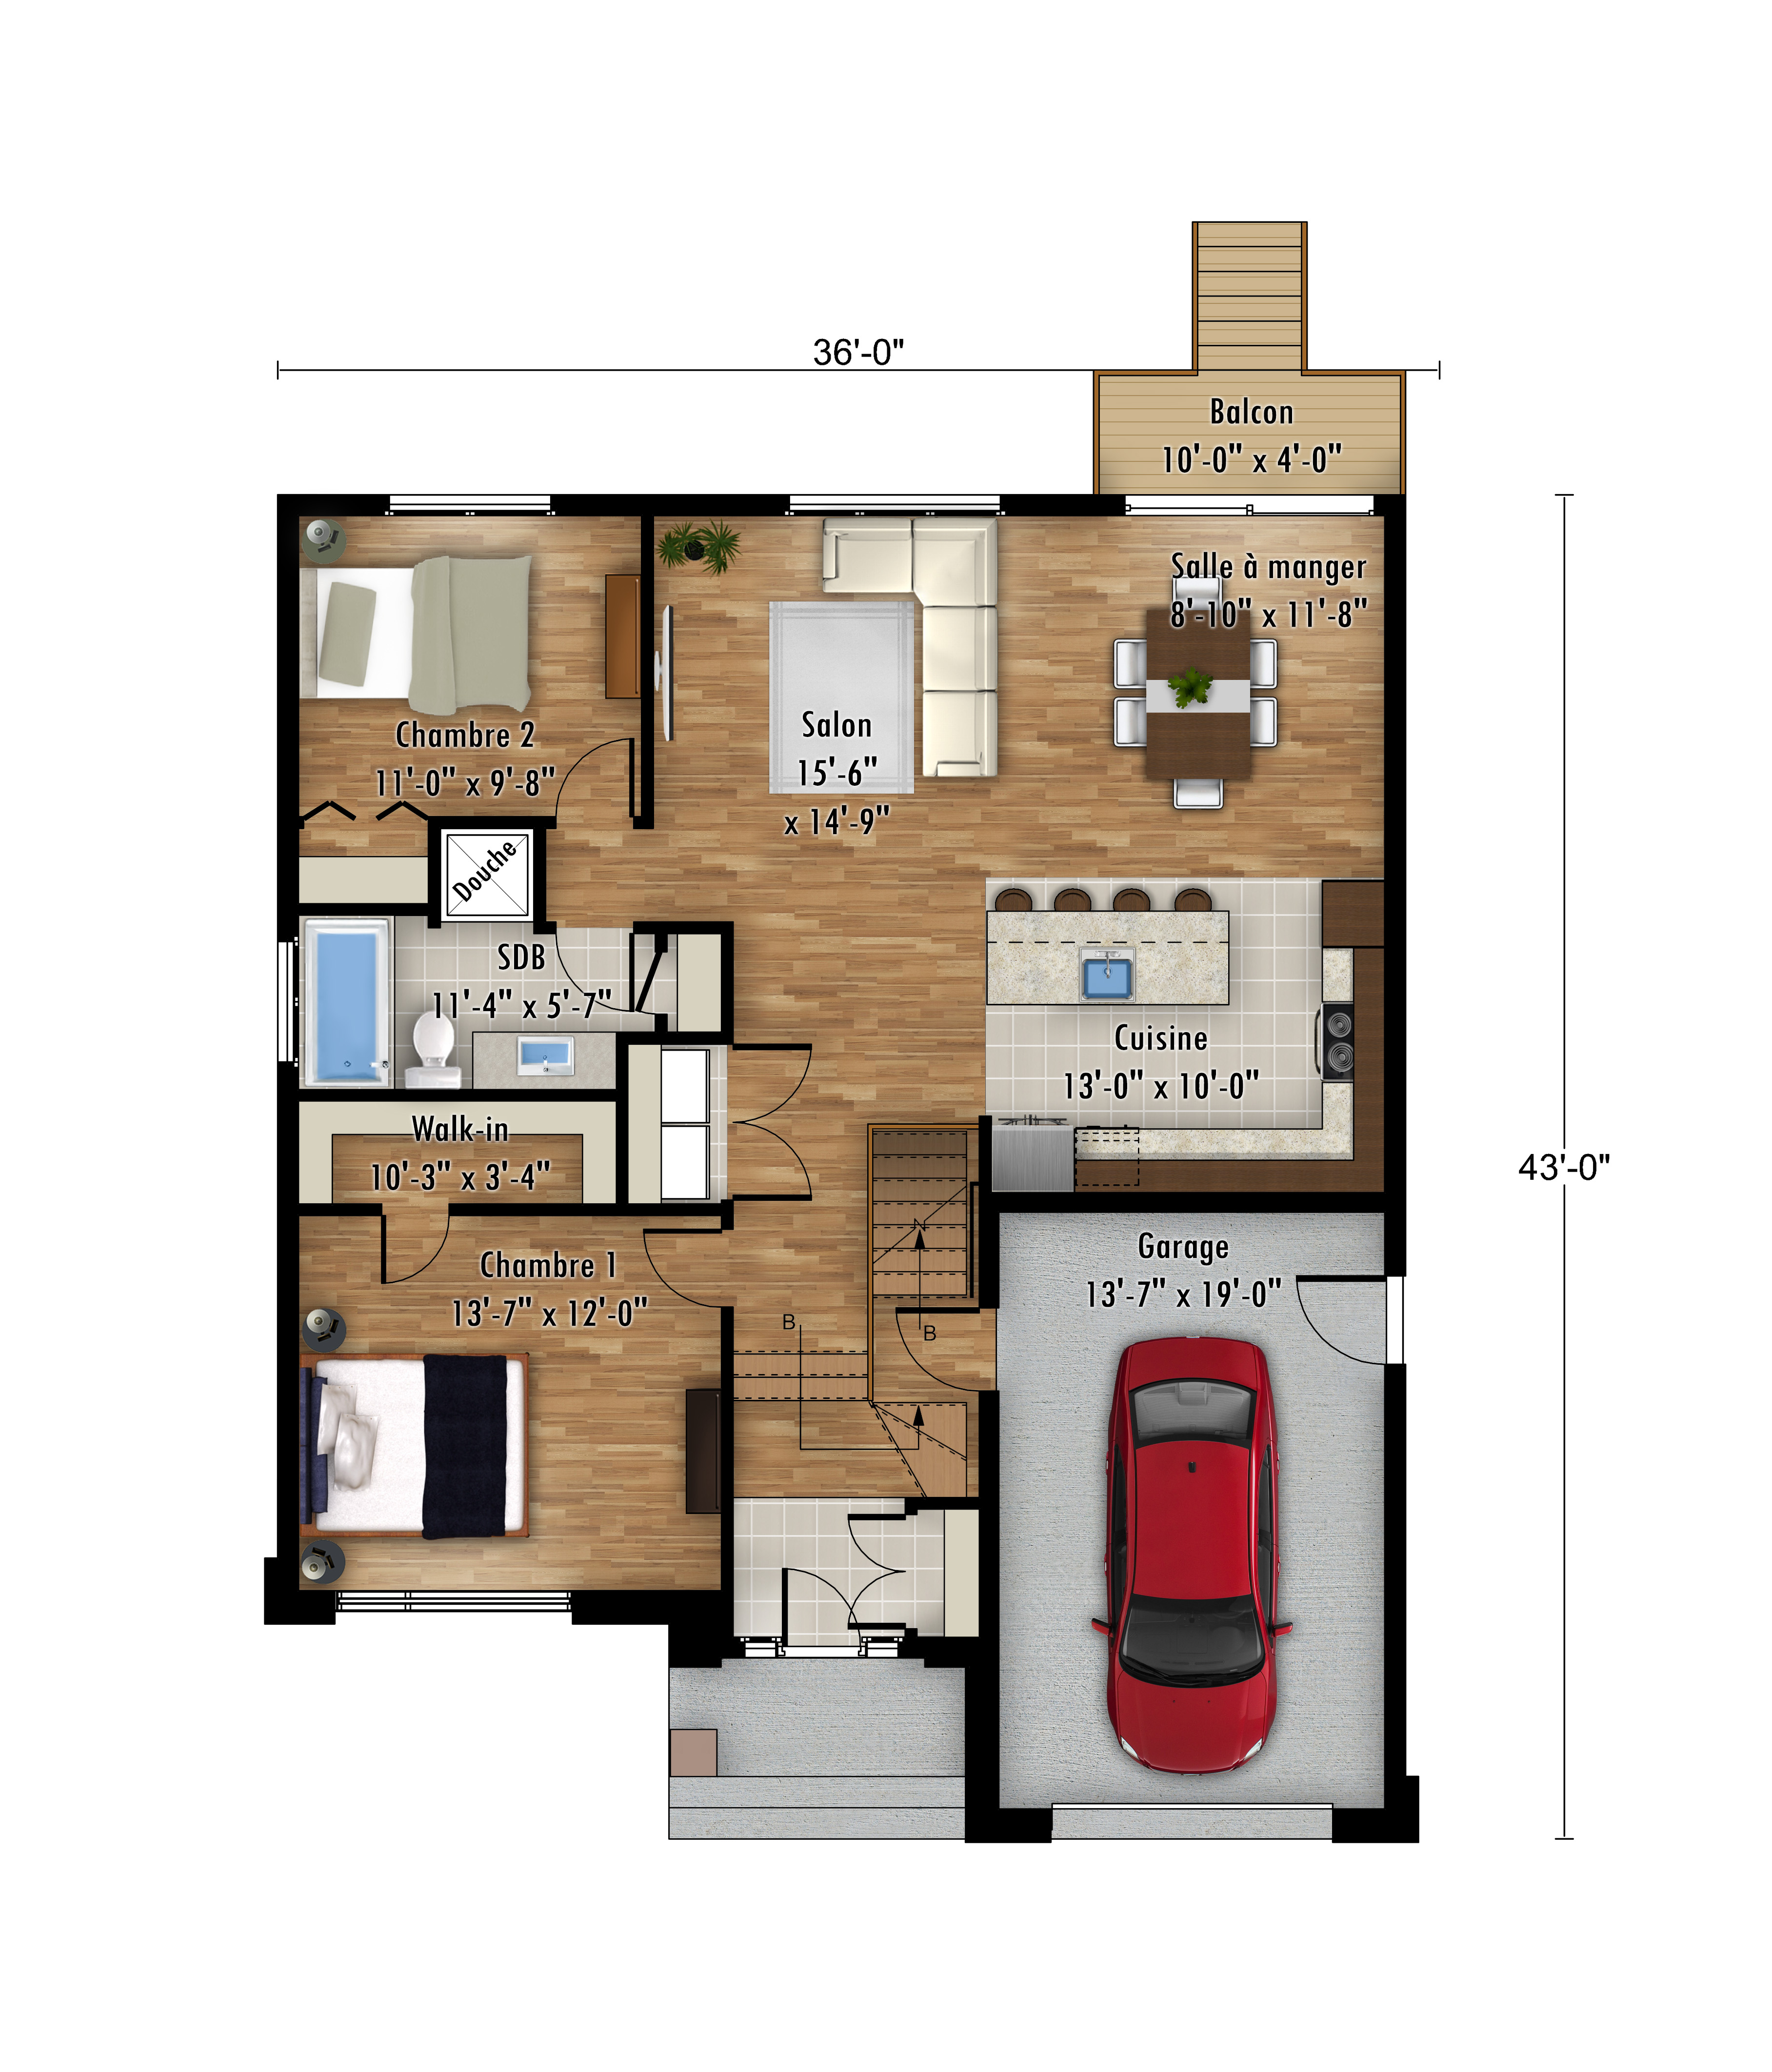 Plan modèle Pyranga - Maisons neuves à Lanaudière